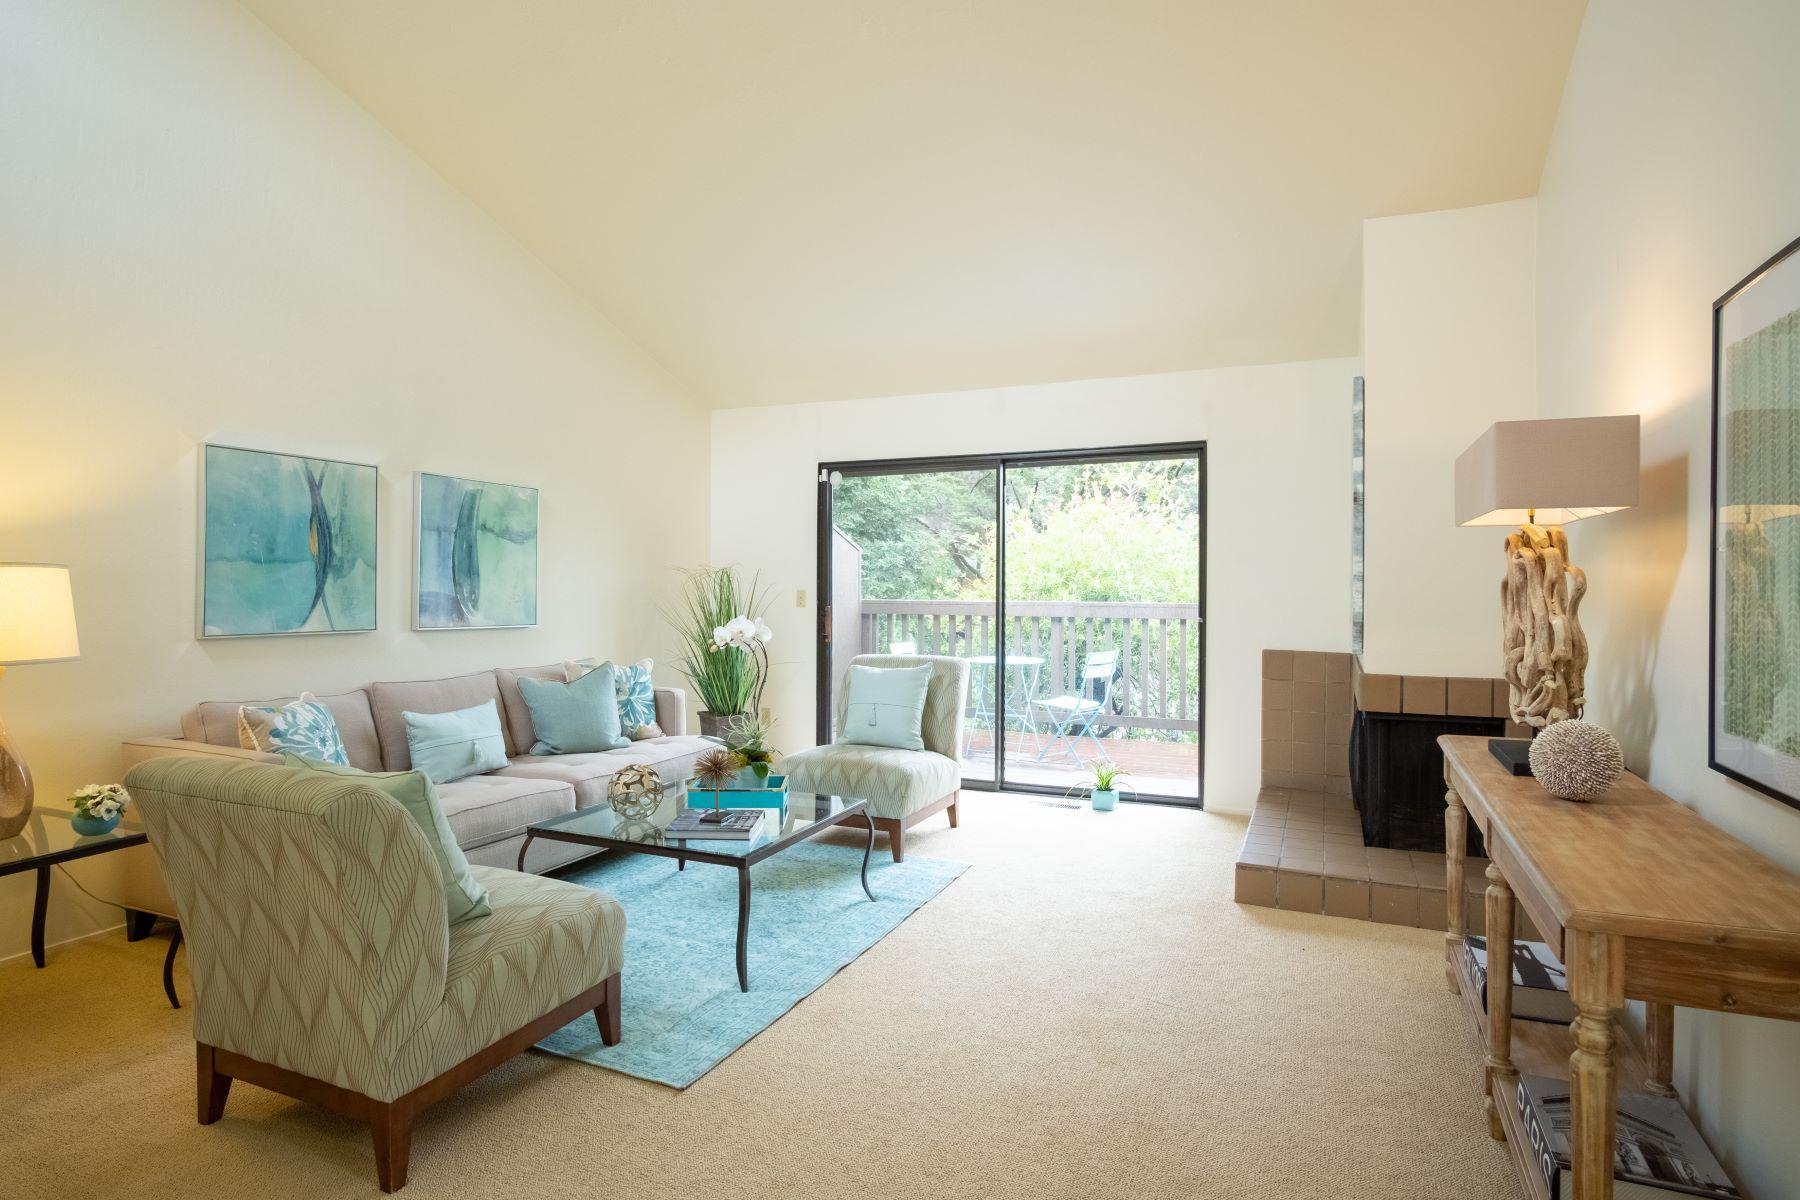 Casa unifamiliar adosada (Townhouse) por un Venta en Spacious End Unit in Greenbrae 55 Corte Real #15 Greenbrae, California 94904 Estados Unidos